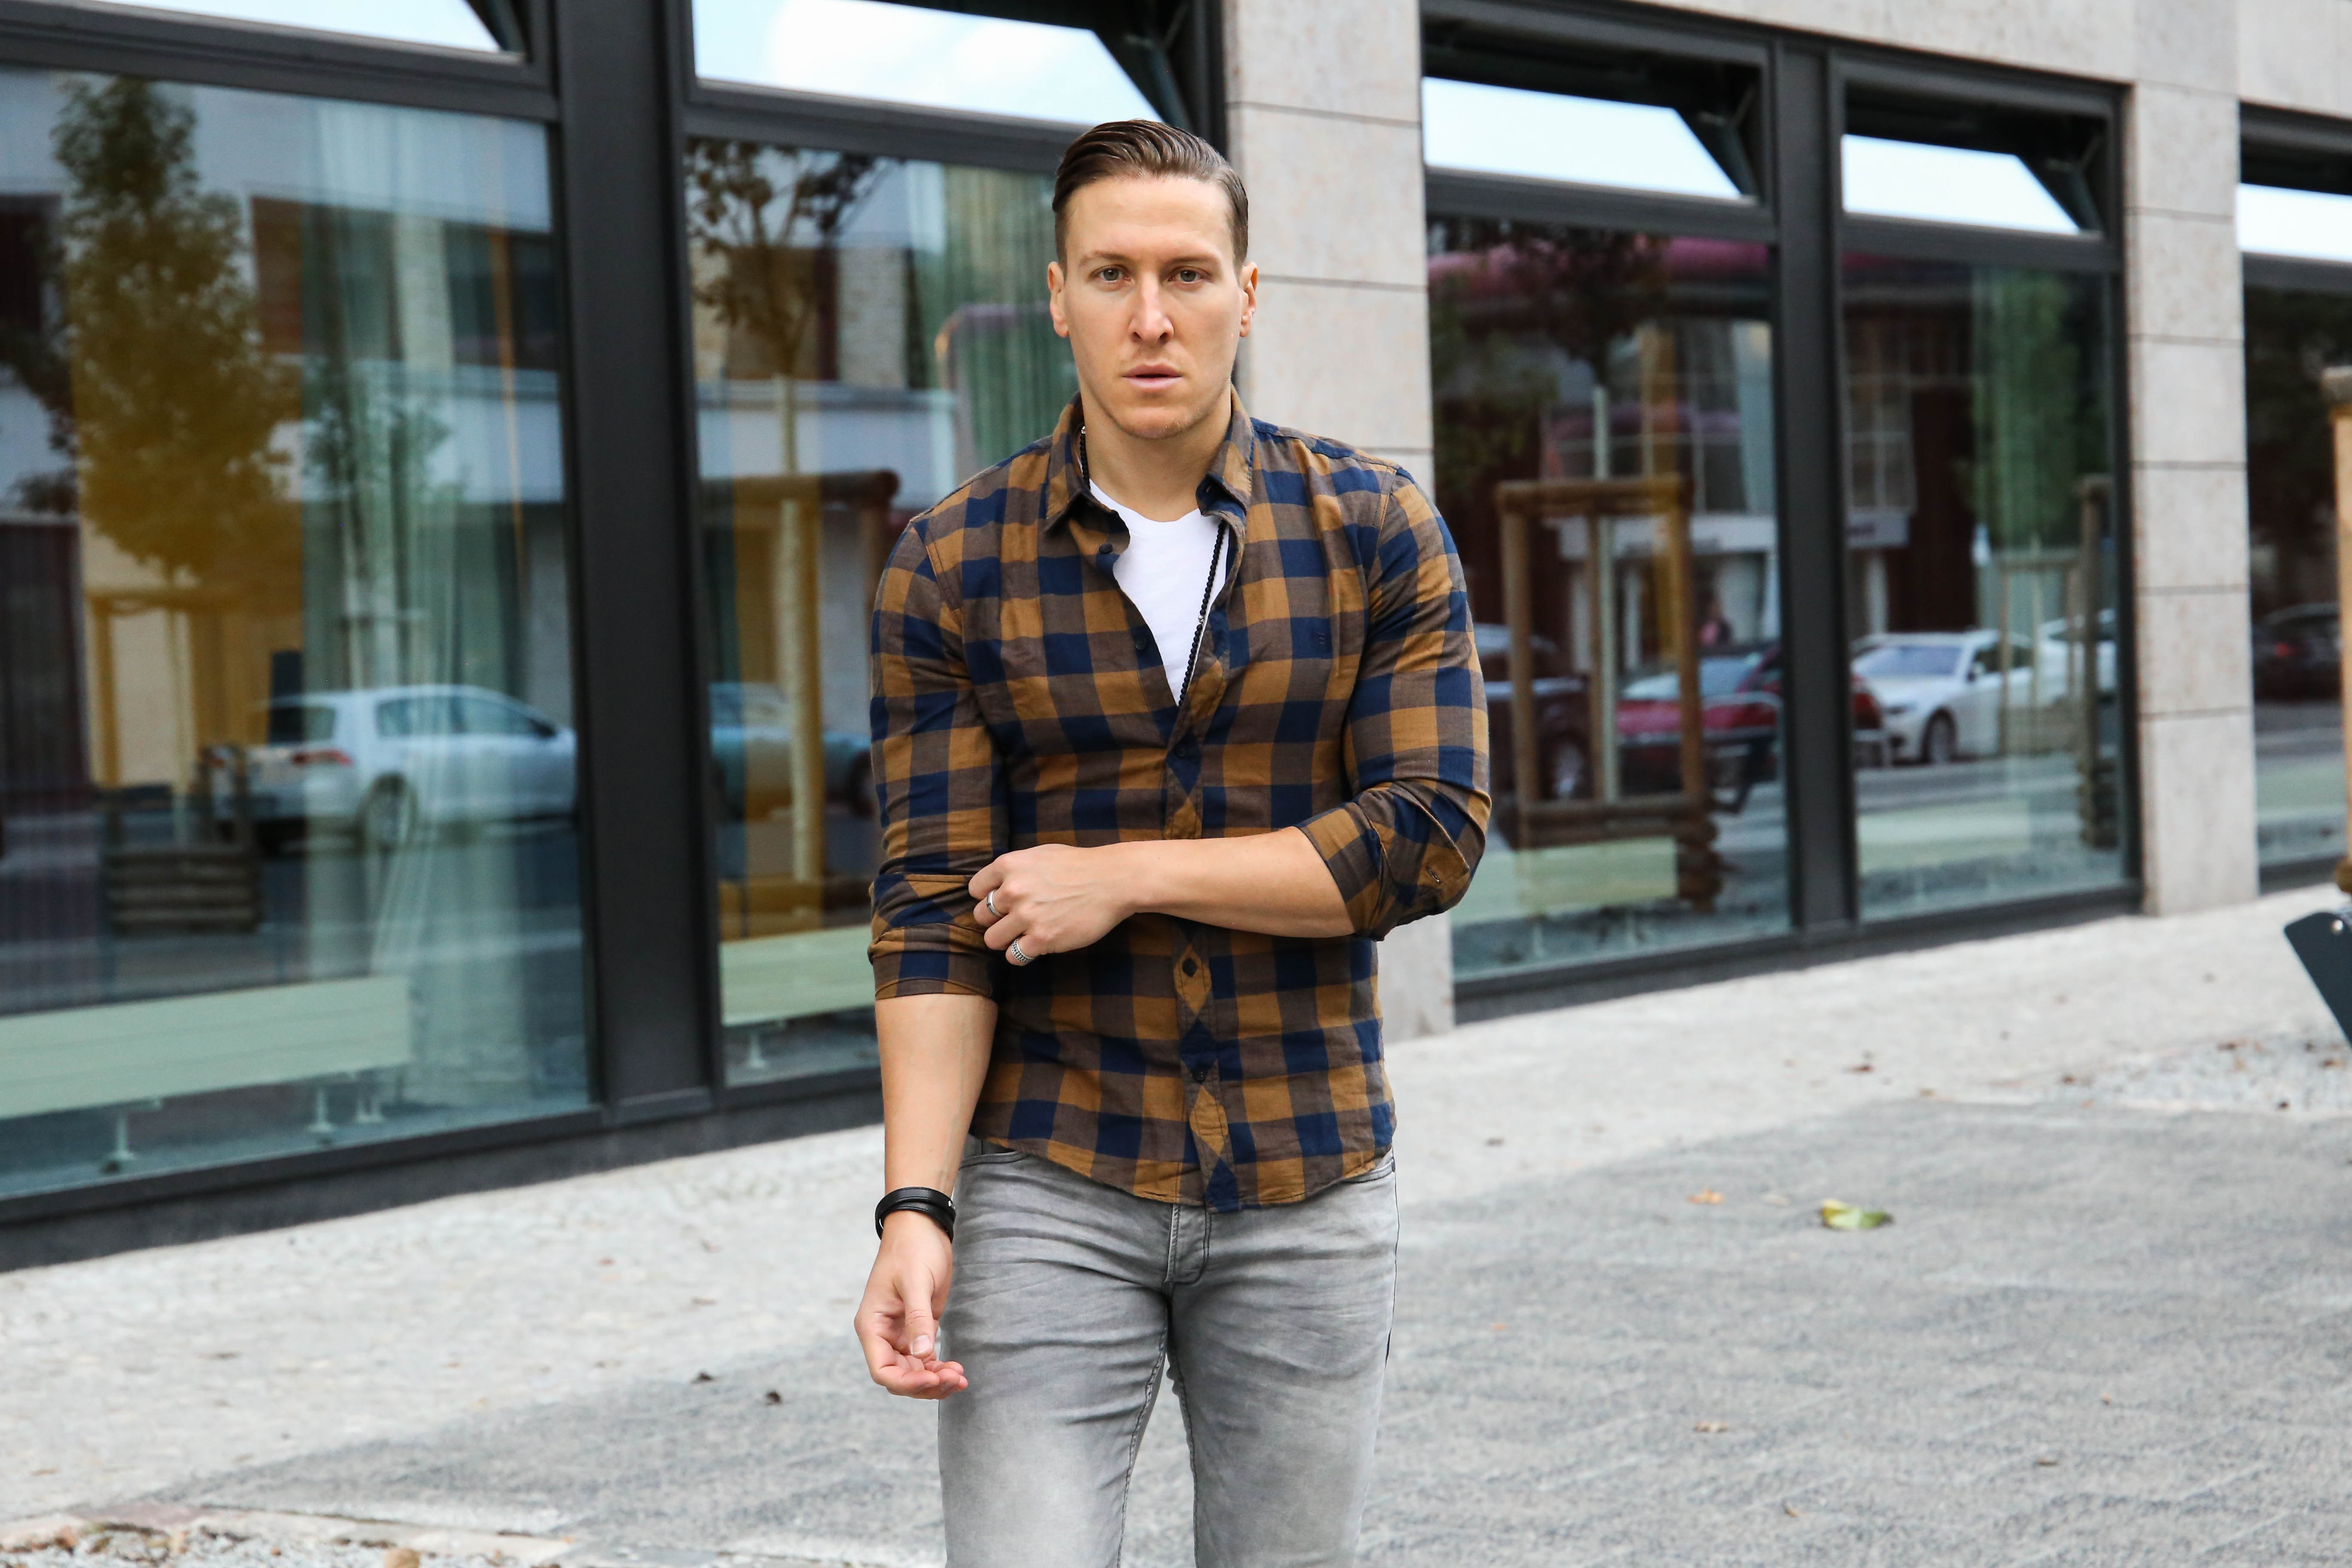 lässiger-herbstlook-graue-jeans-braunes-holzfällerhemd-modeblog-fashionblog-fashion-blogger-berlin_1580